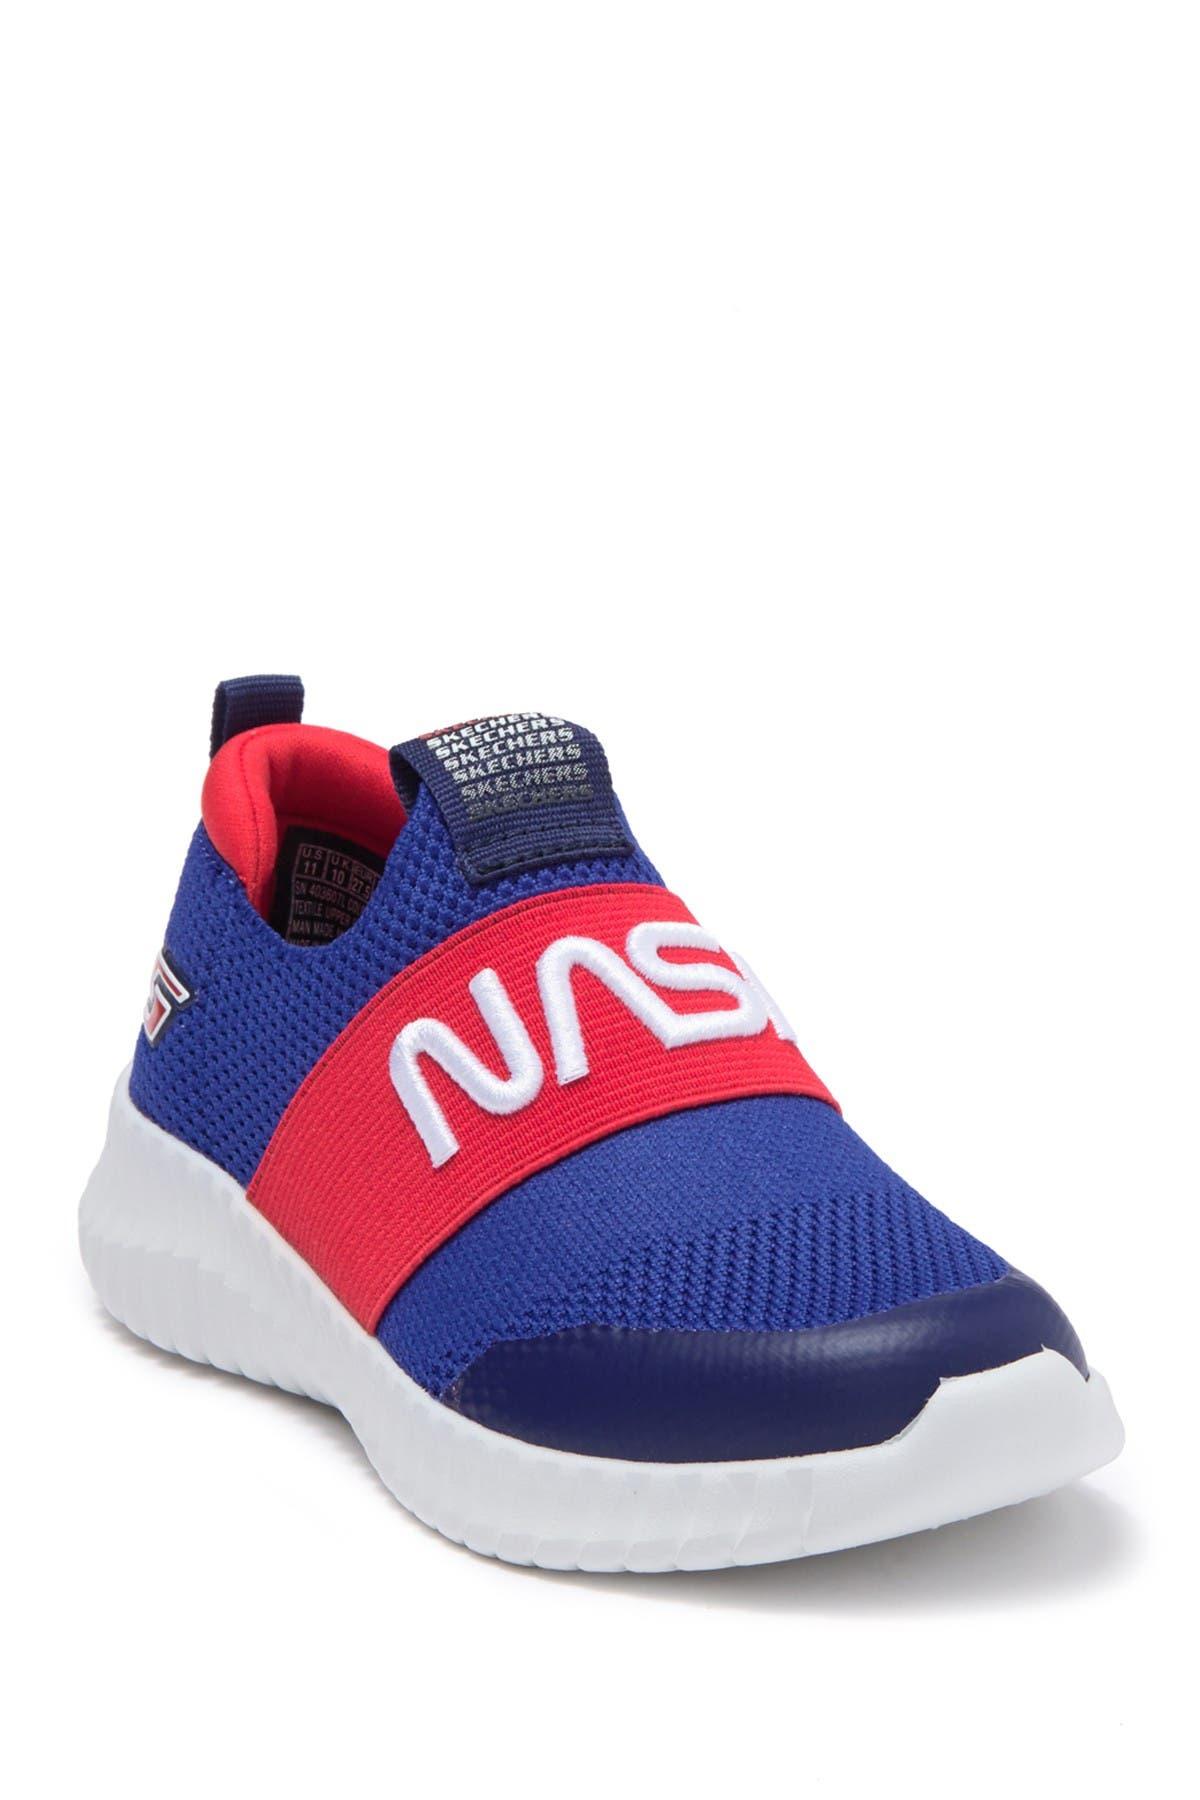 Skechers Kids' Boys' Shoes | Nordstrom Rack